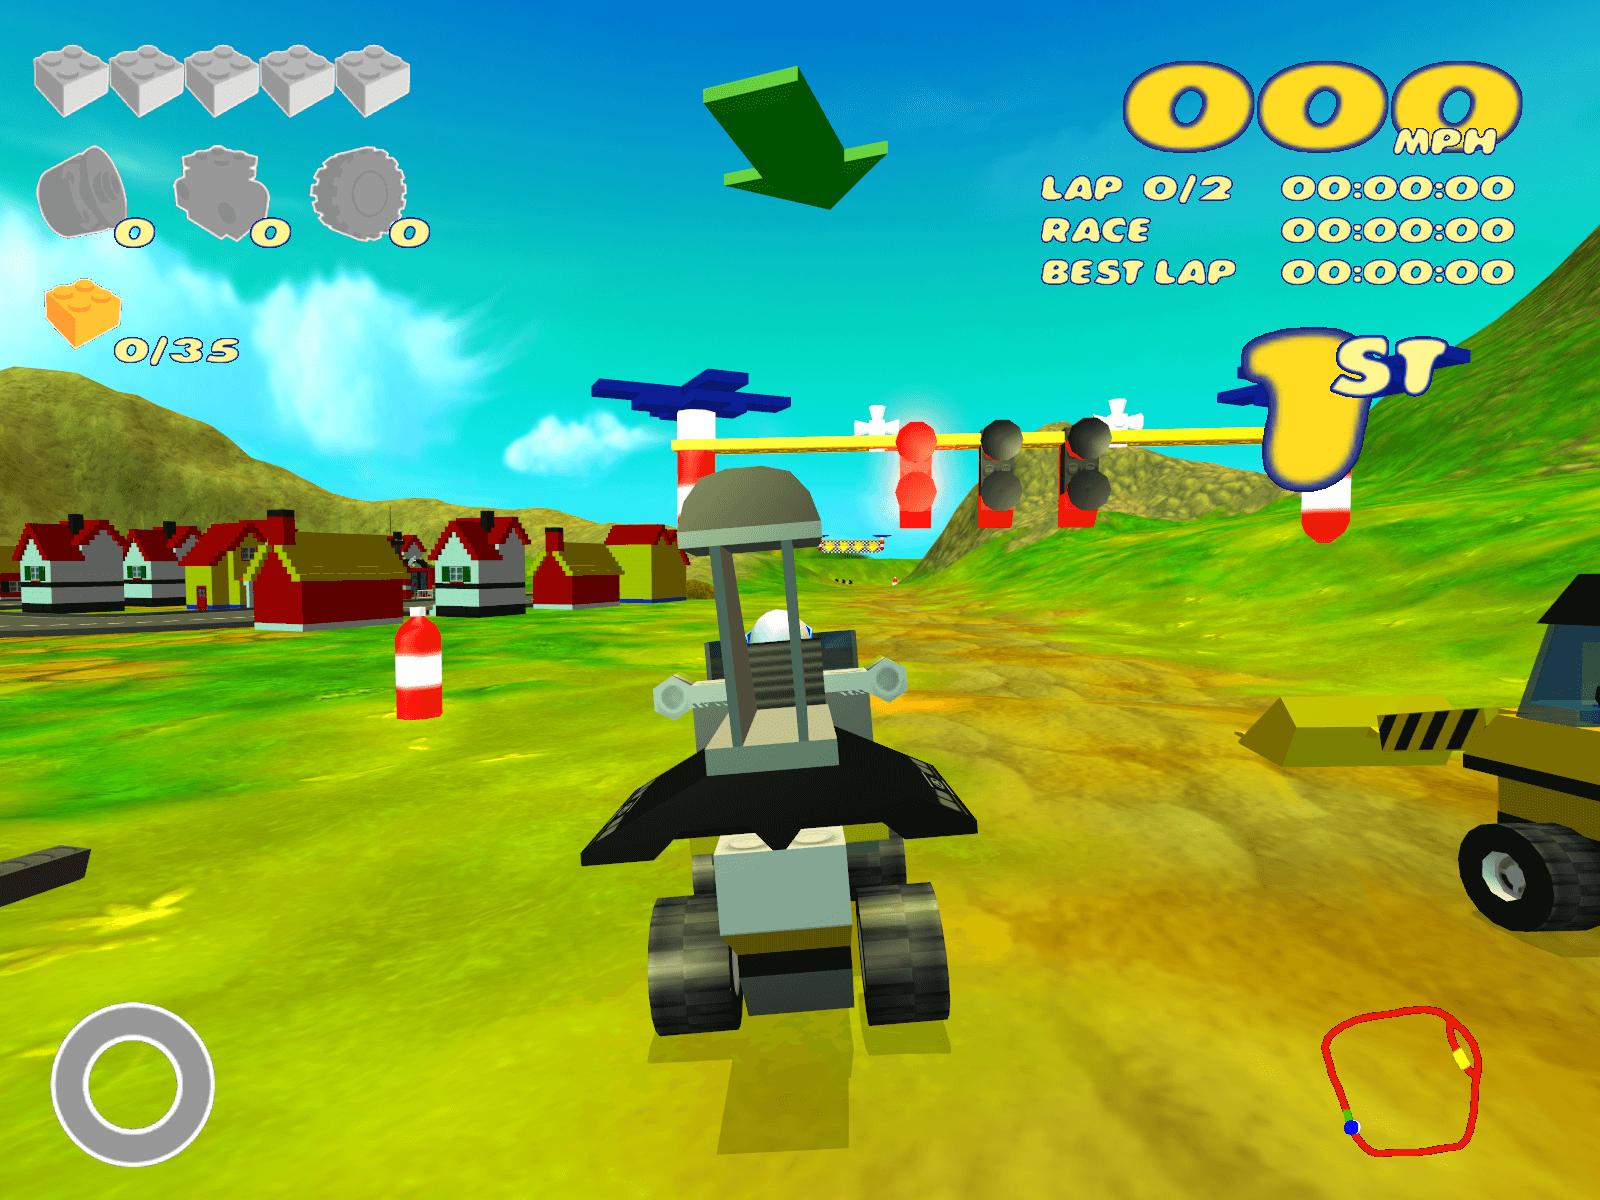 lego racers 2 download windows 7